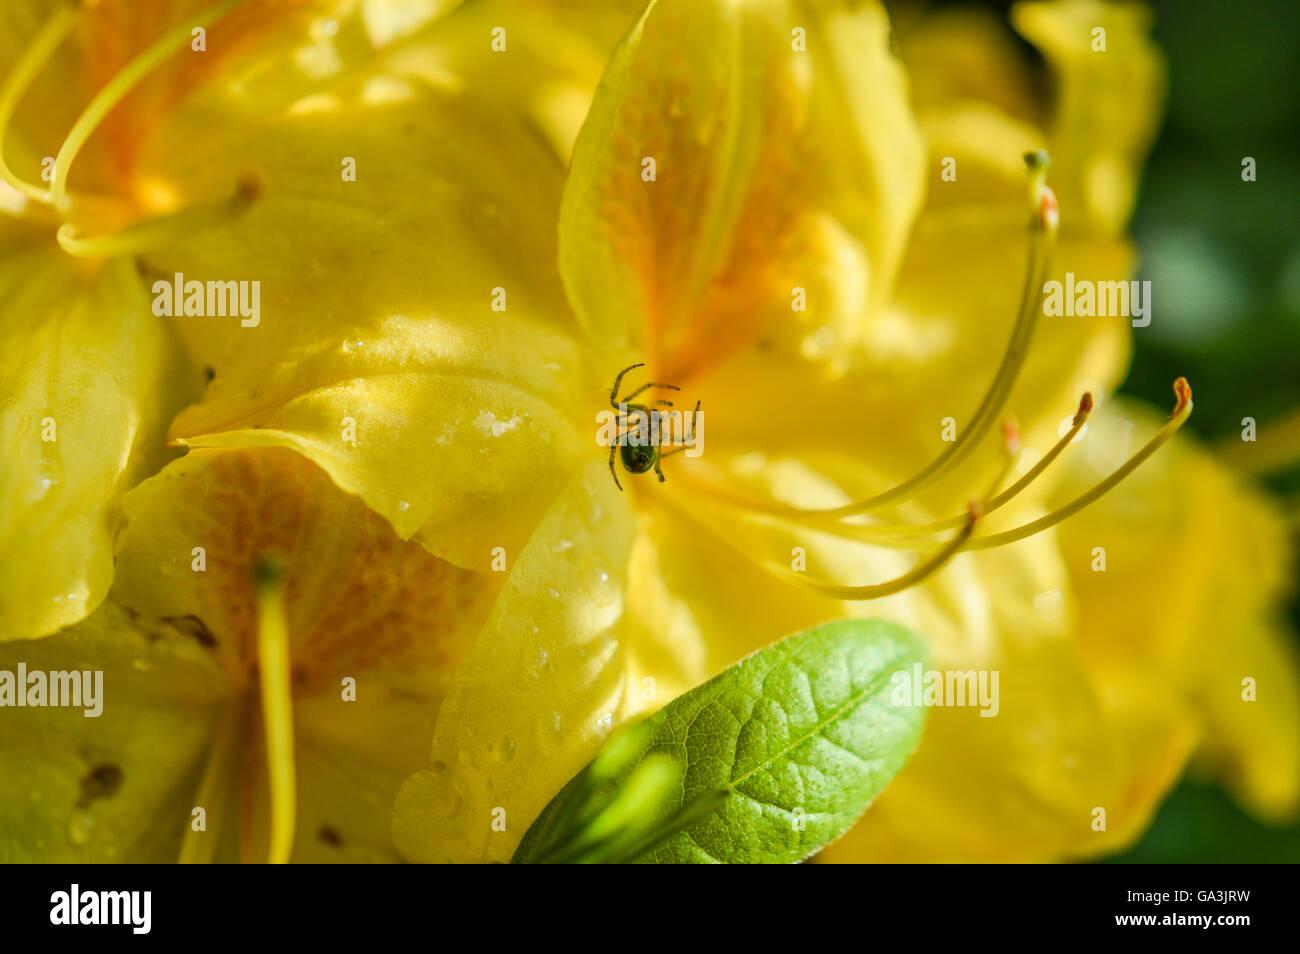 azalea rhododendron yellow orange stockfotos azalea rhododendron yellow orange bilder alamy. Black Bedroom Furniture Sets. Home Design Ideas